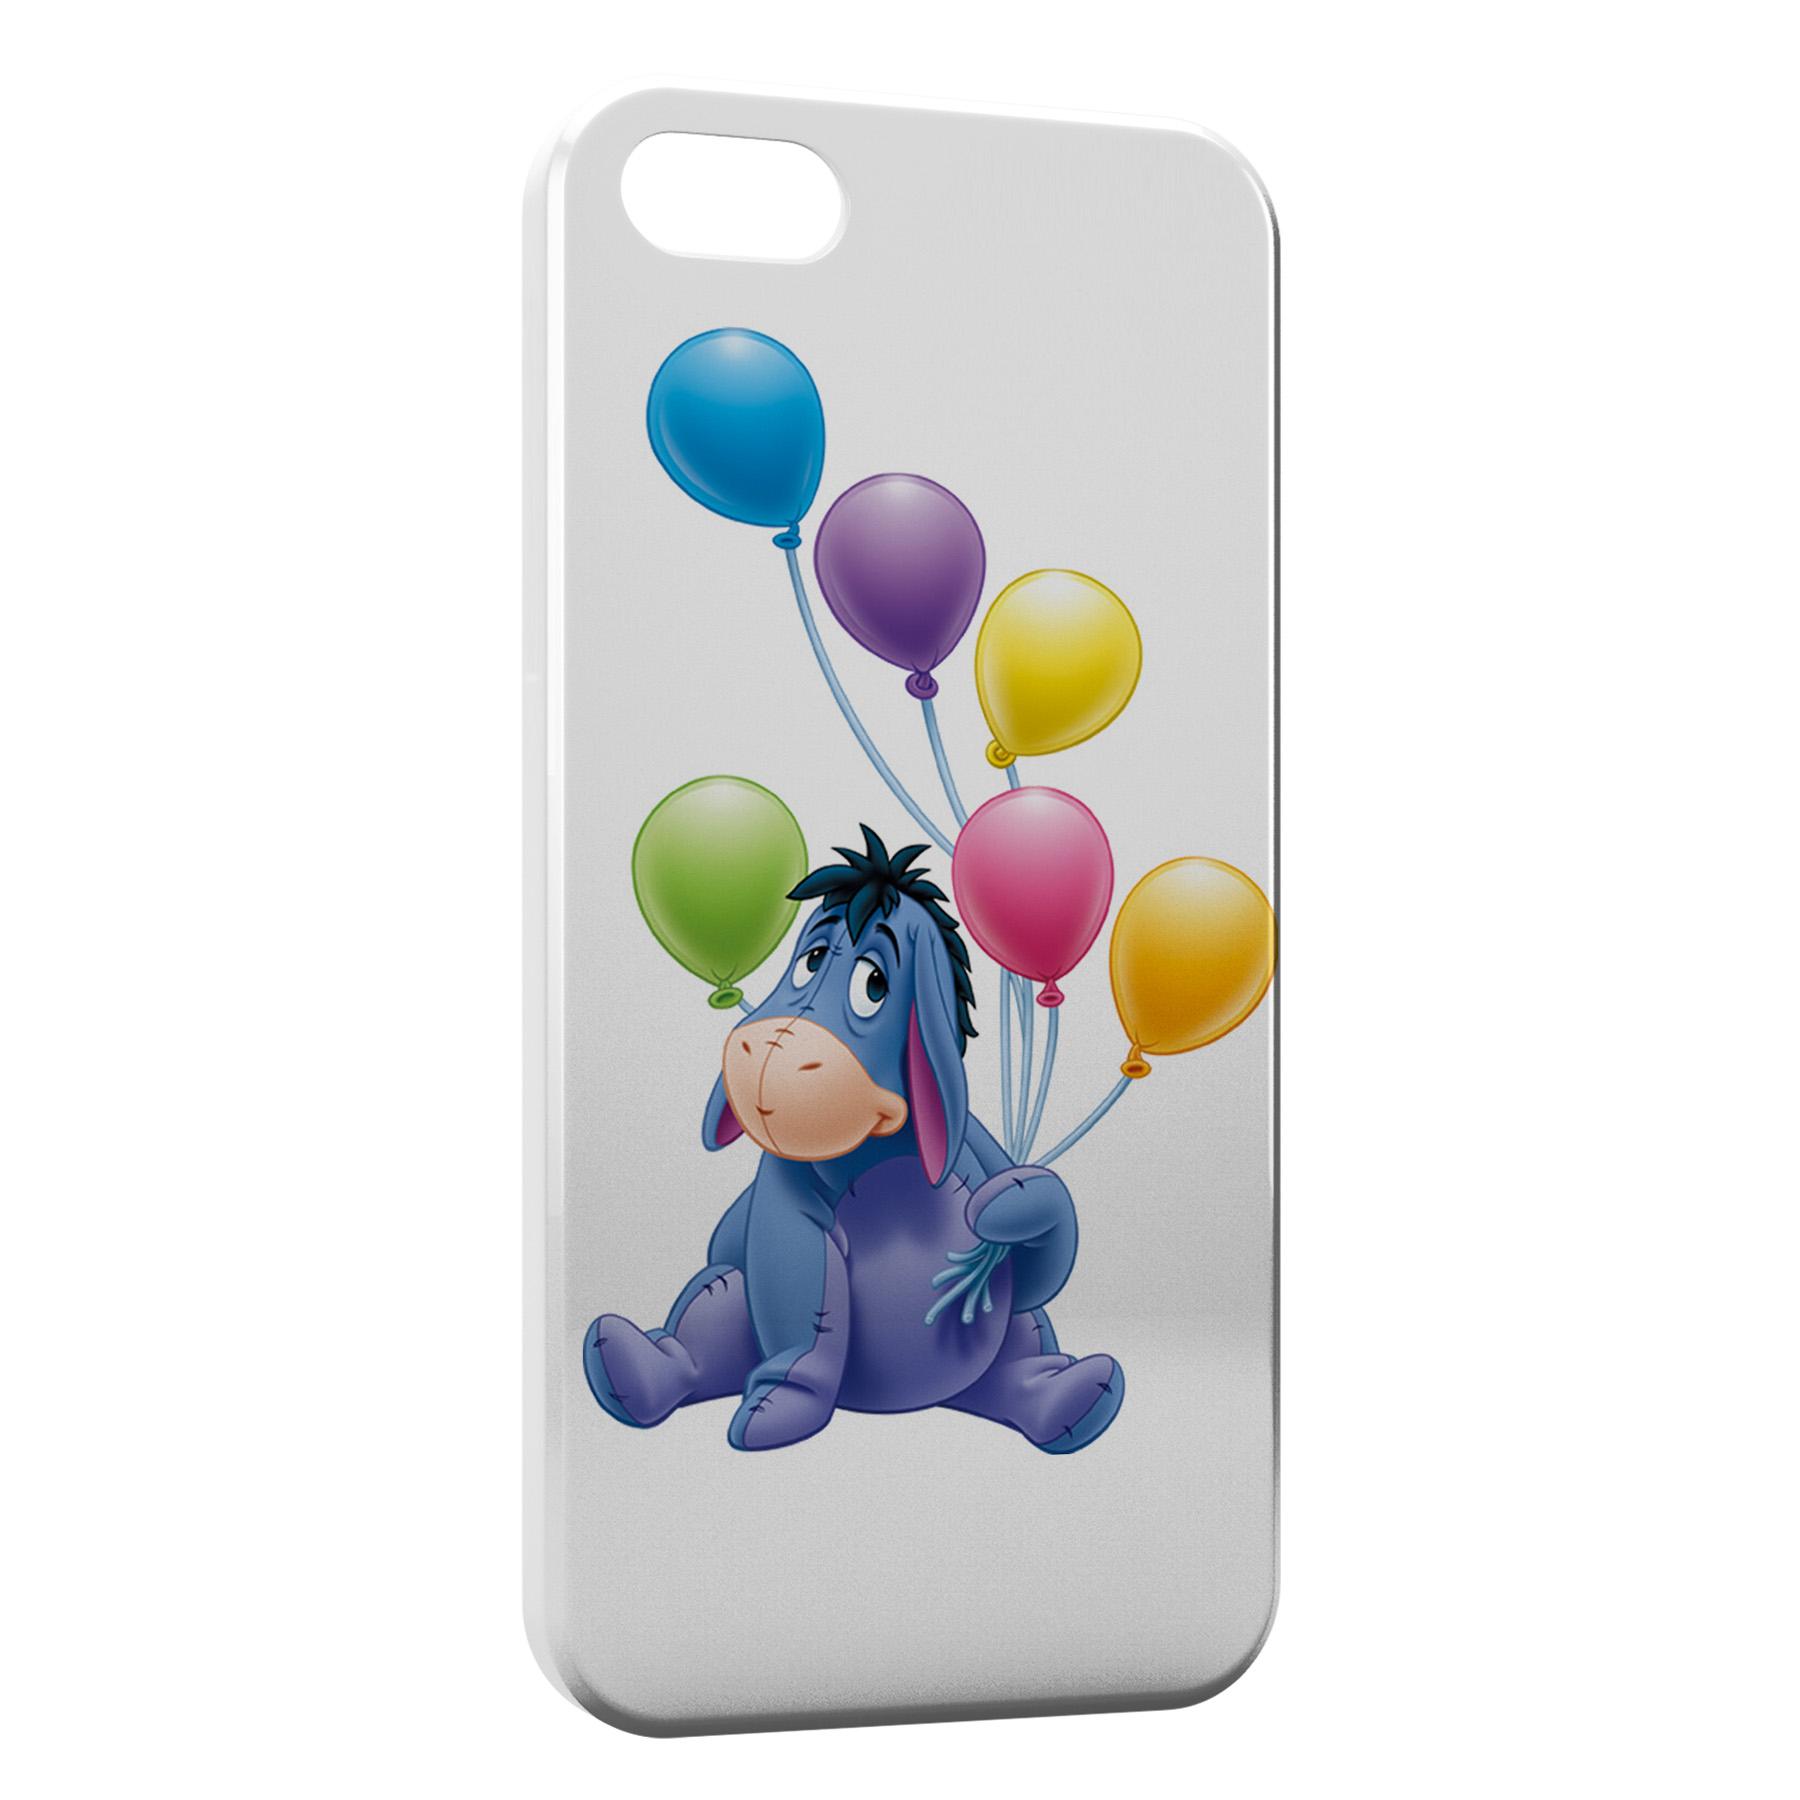 Coque iPhone 4 4S Bourriquet Anniversaire